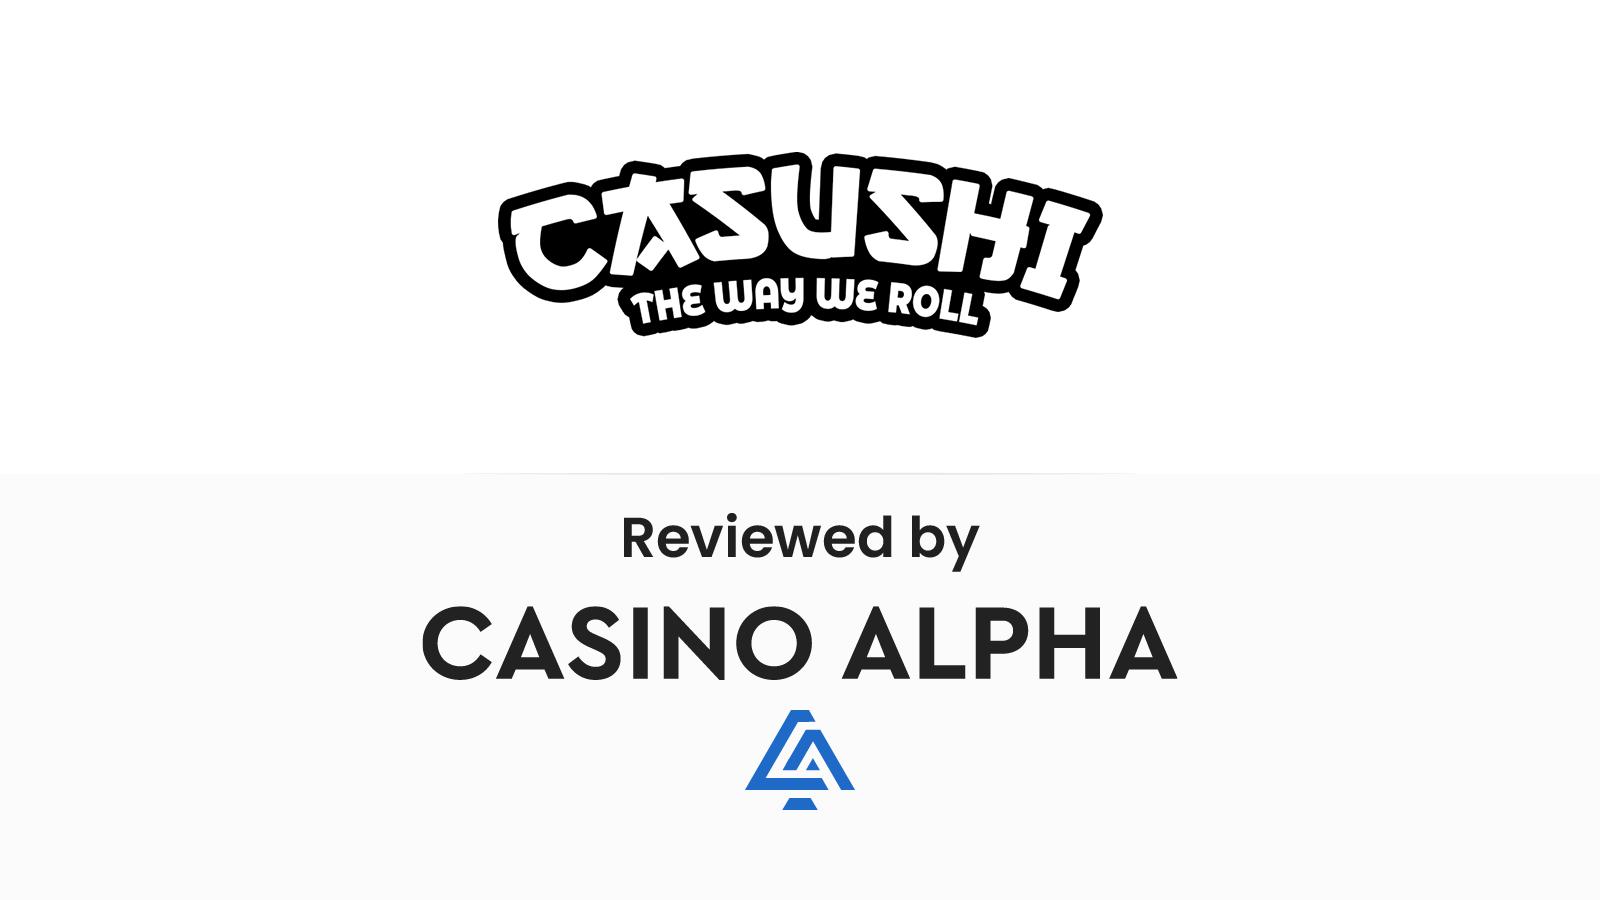 Casushi Review & Bonuses